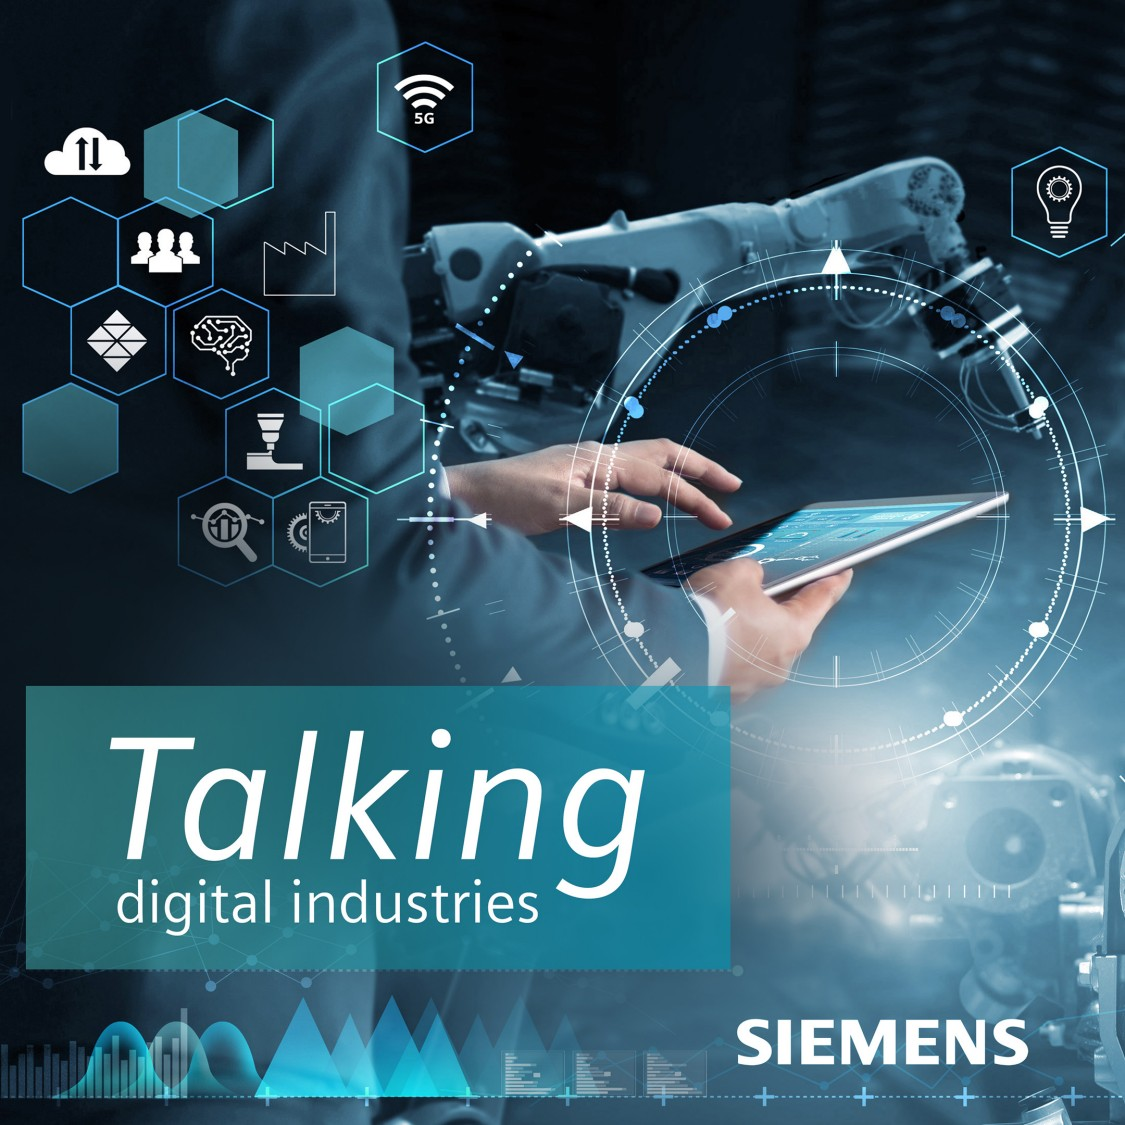 Talking digital industries